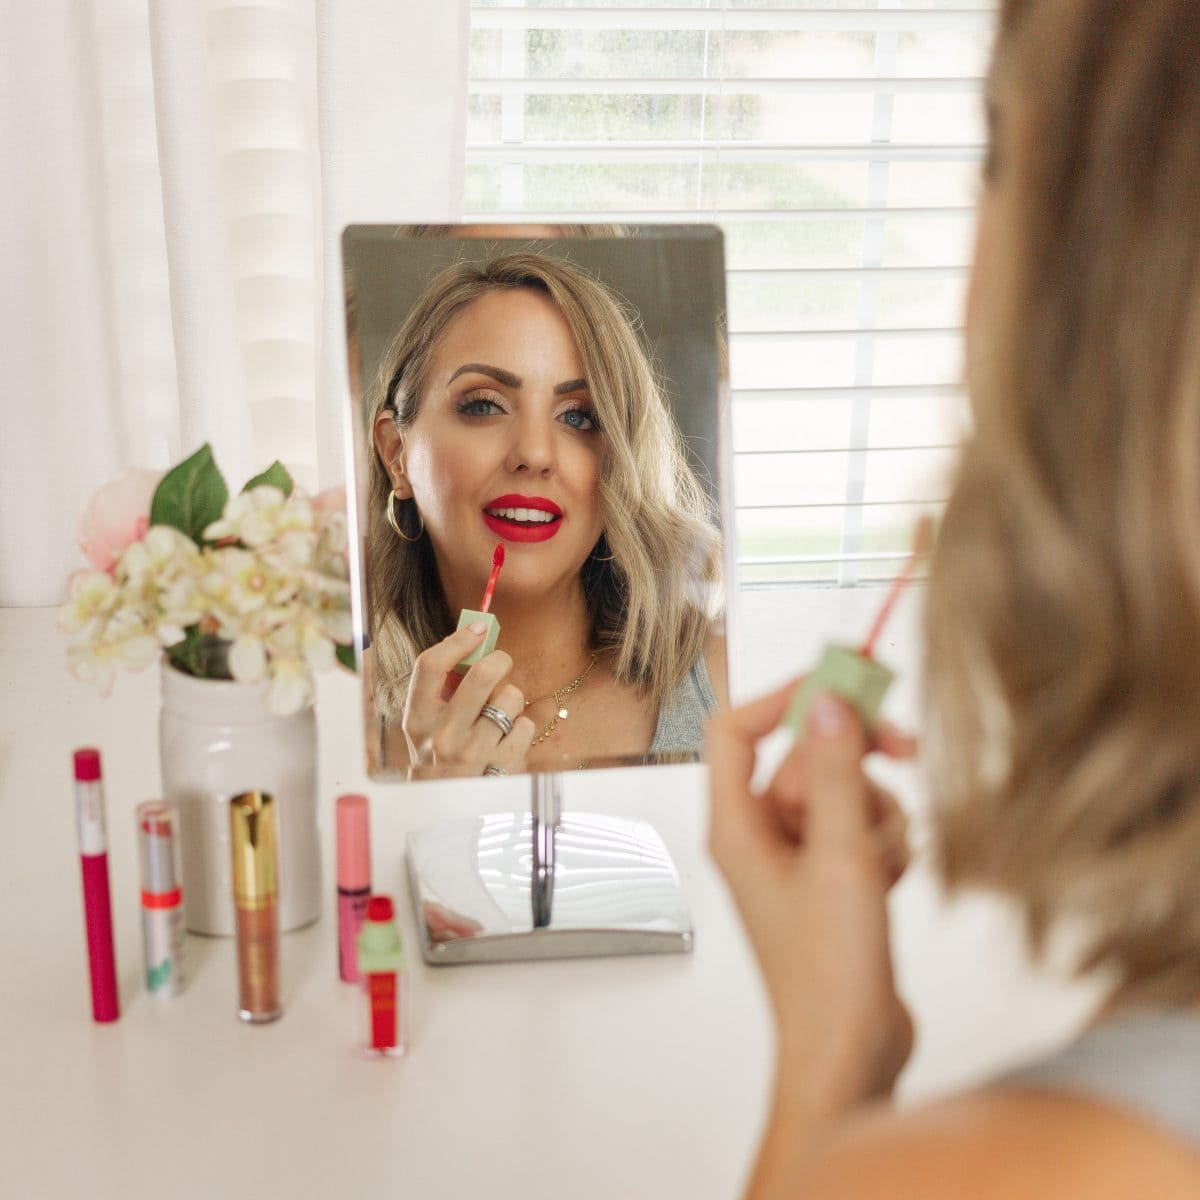 Houston beauty blogger Meg O. shares the best drugstore lip products for summer